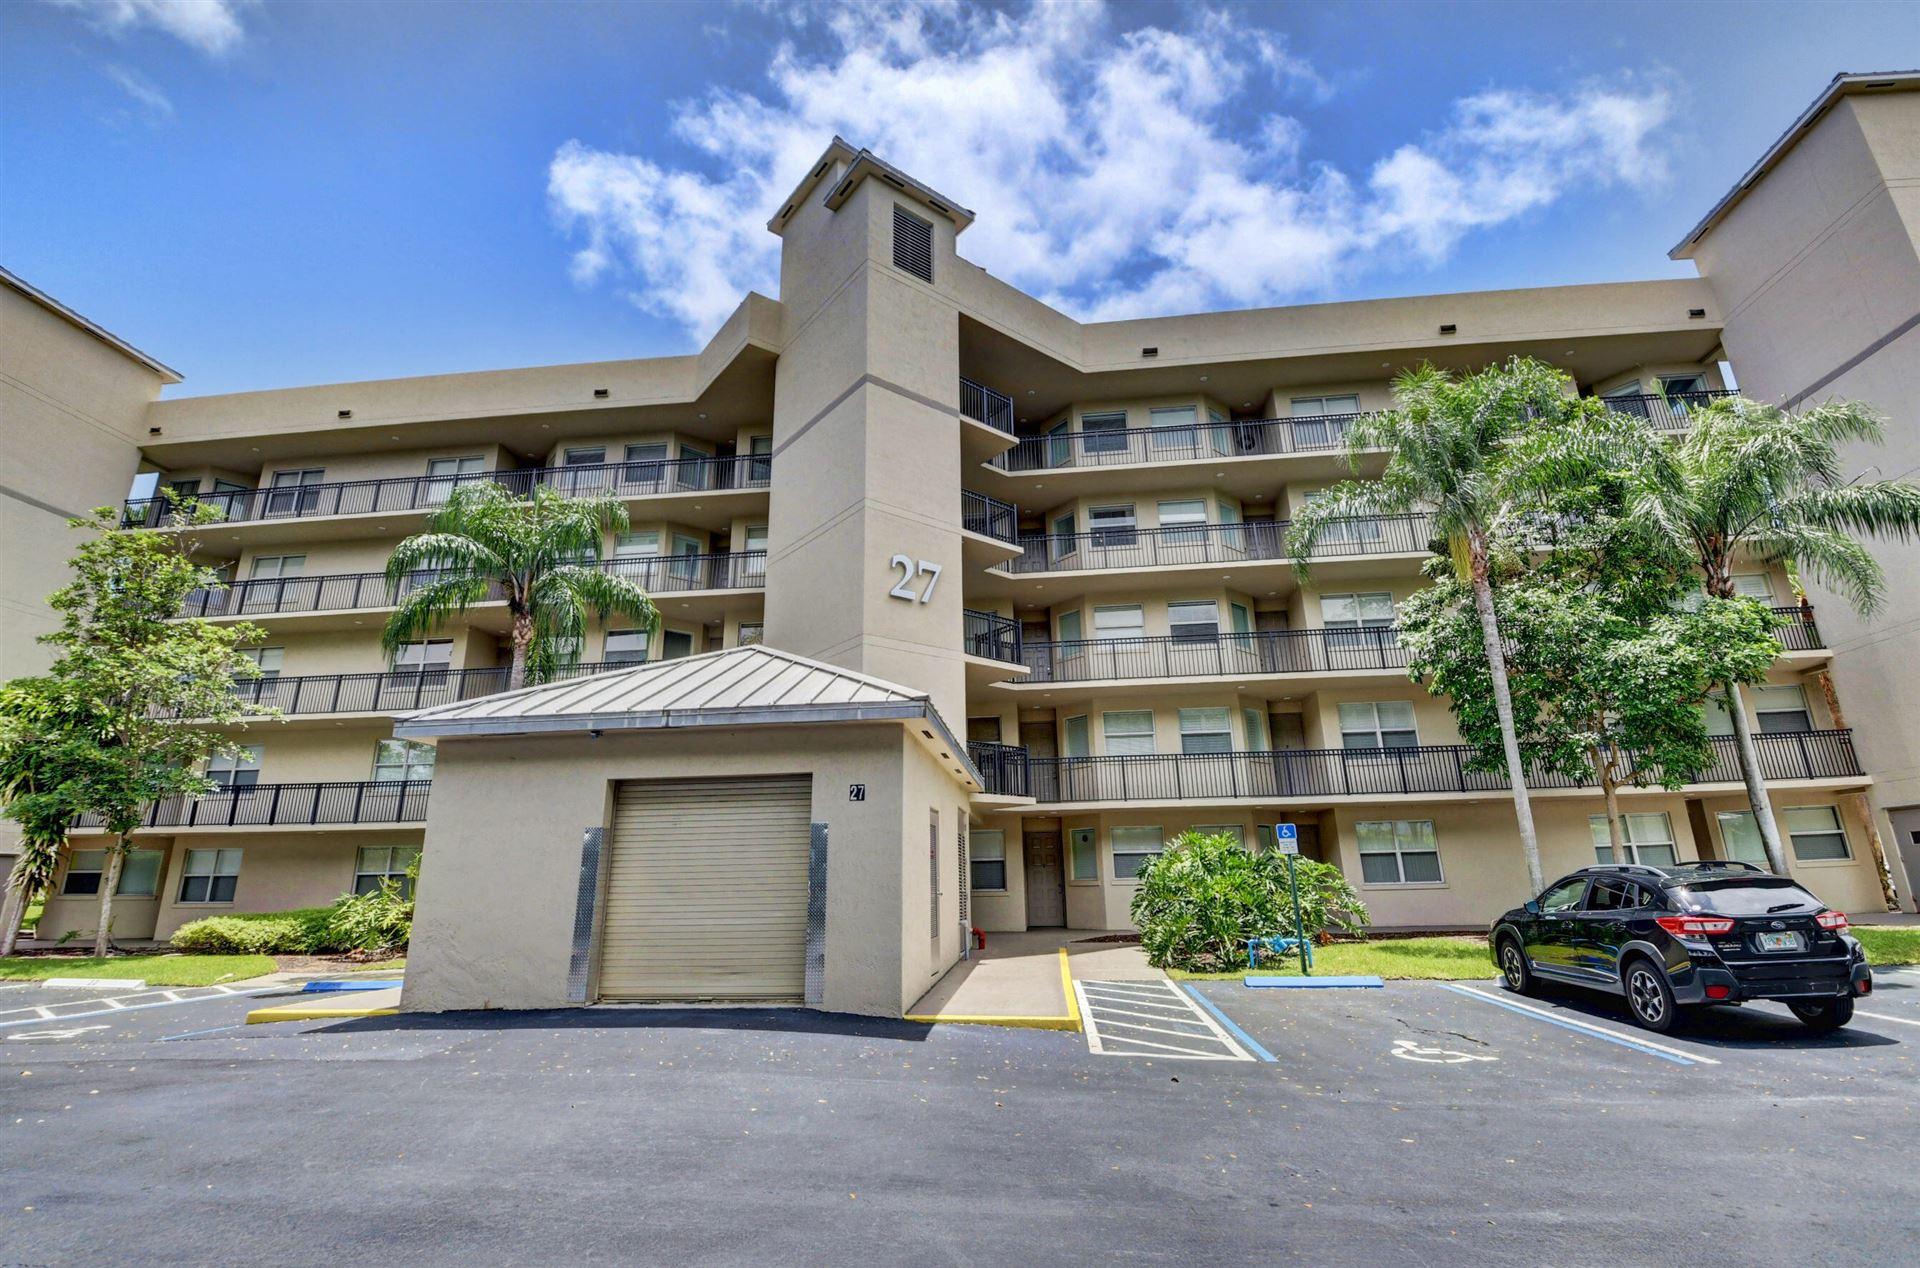 Photo of 27 Royal Palm Way #404, Boca Raton, FL 33432 (MLS # RX-10733448)